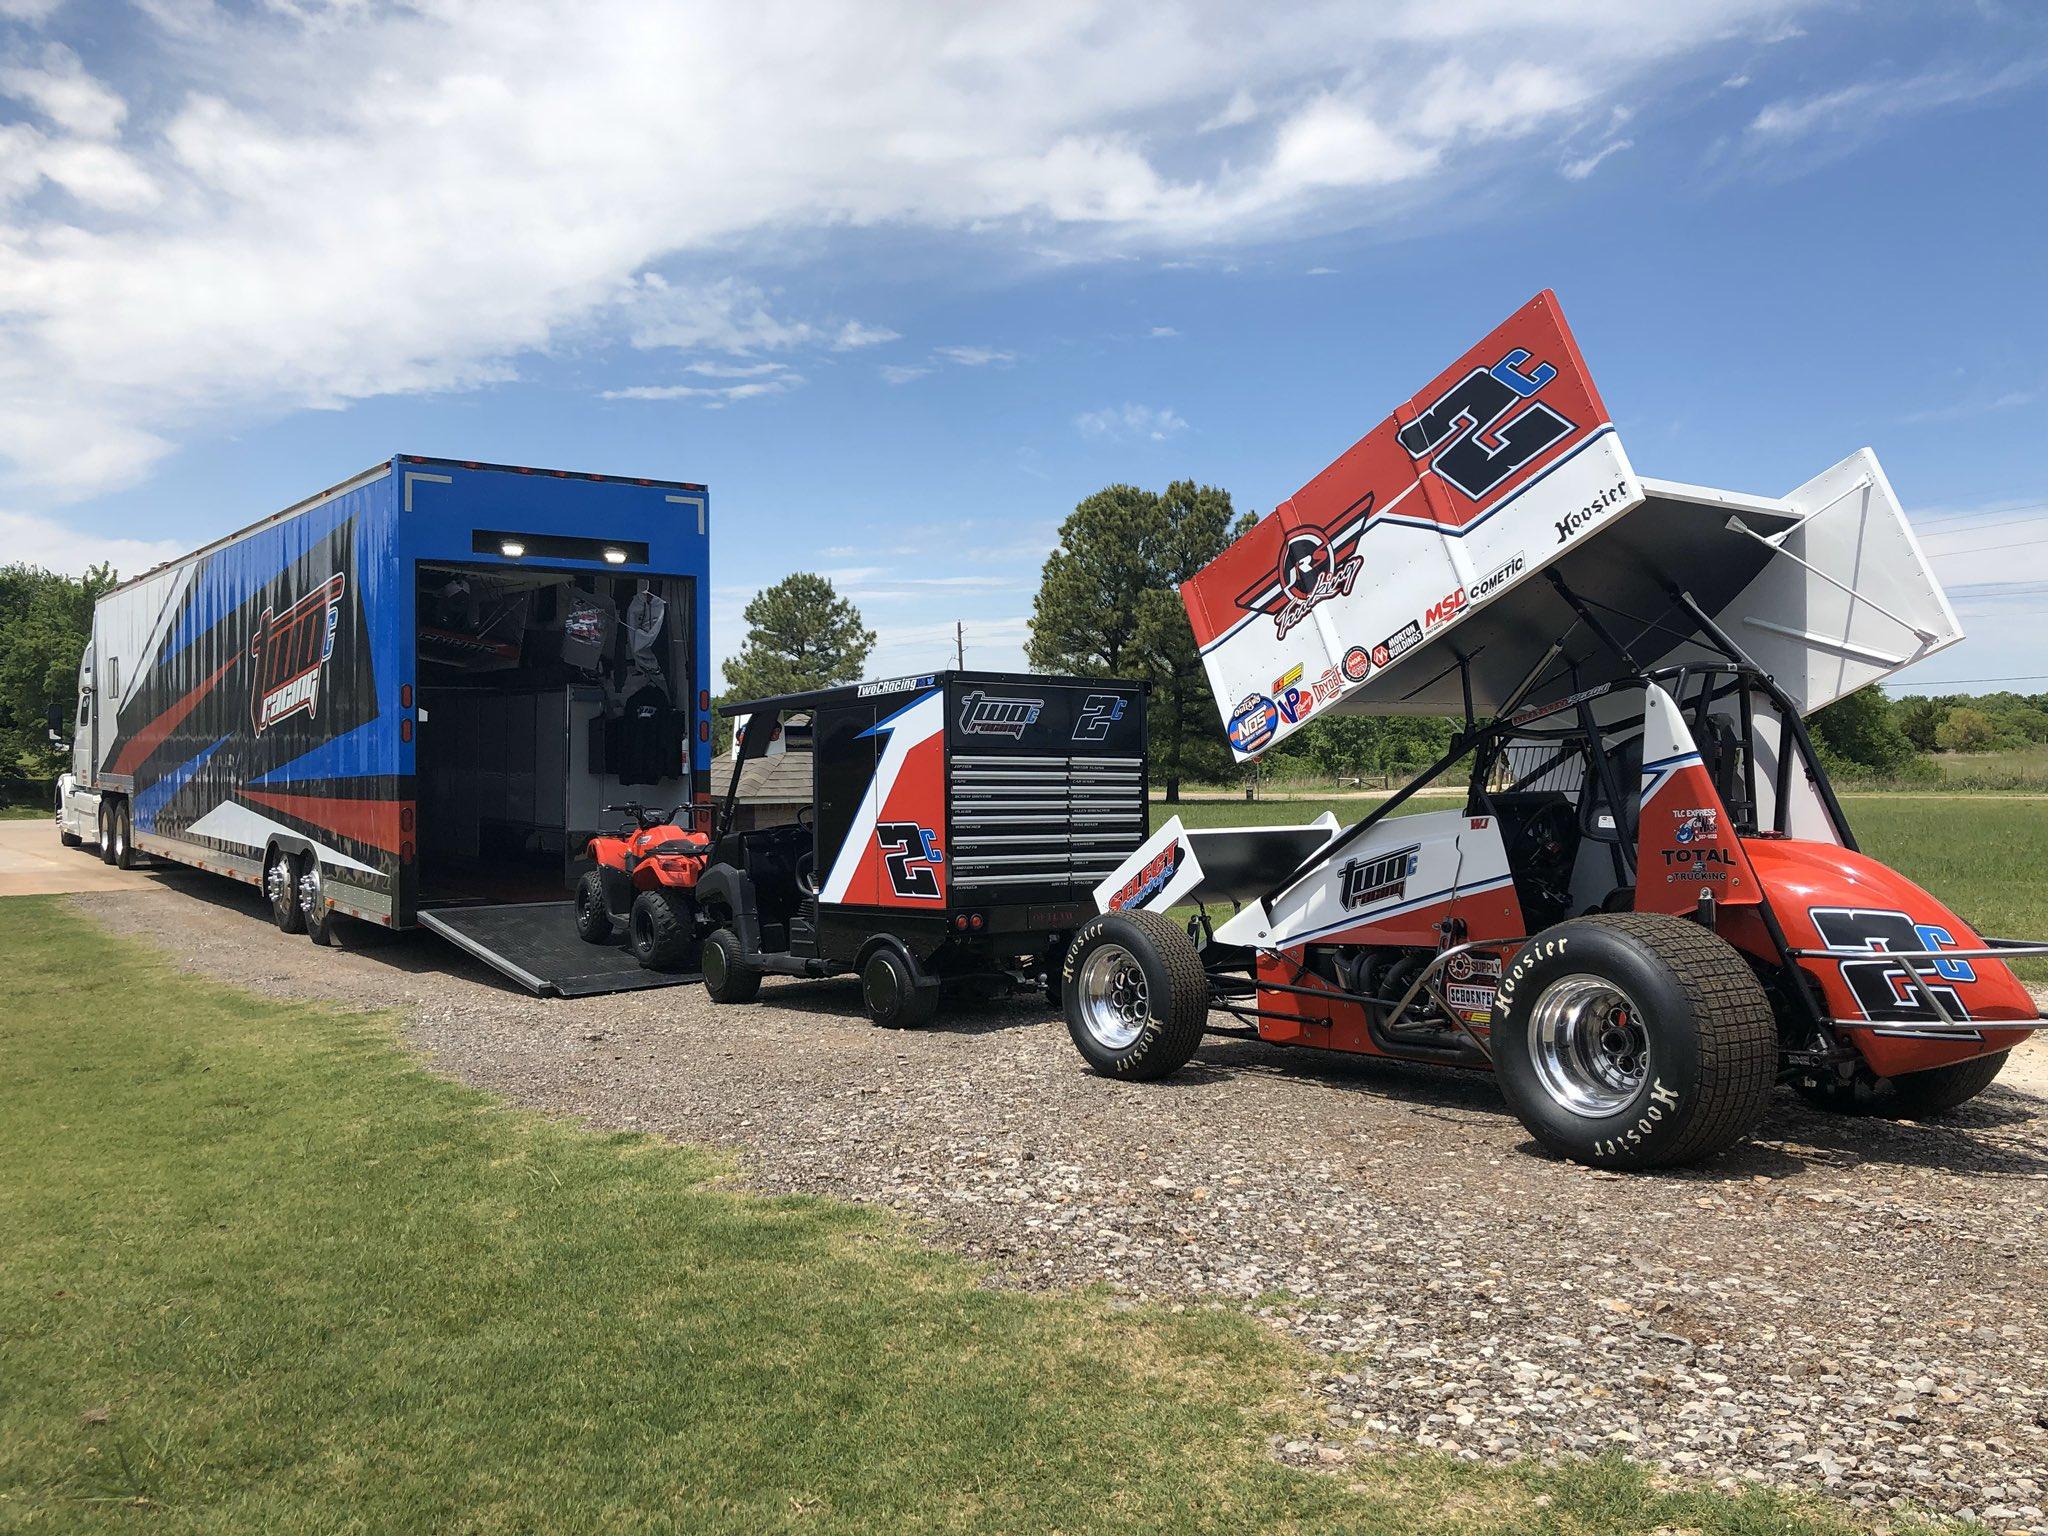 Wayne Johnson Racing